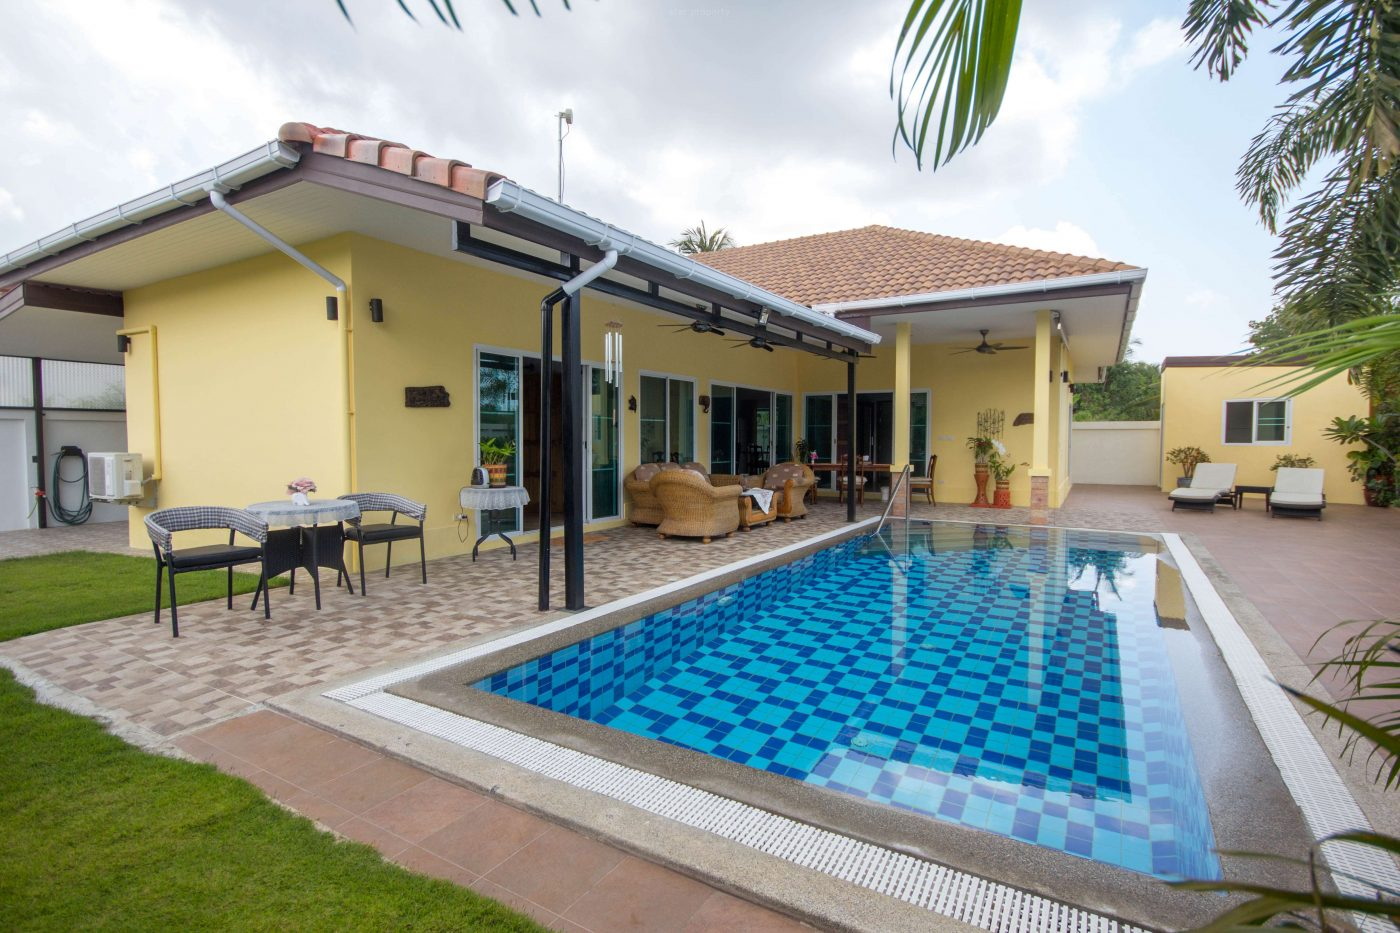 Luxury 3 bedroom pool villa for sale